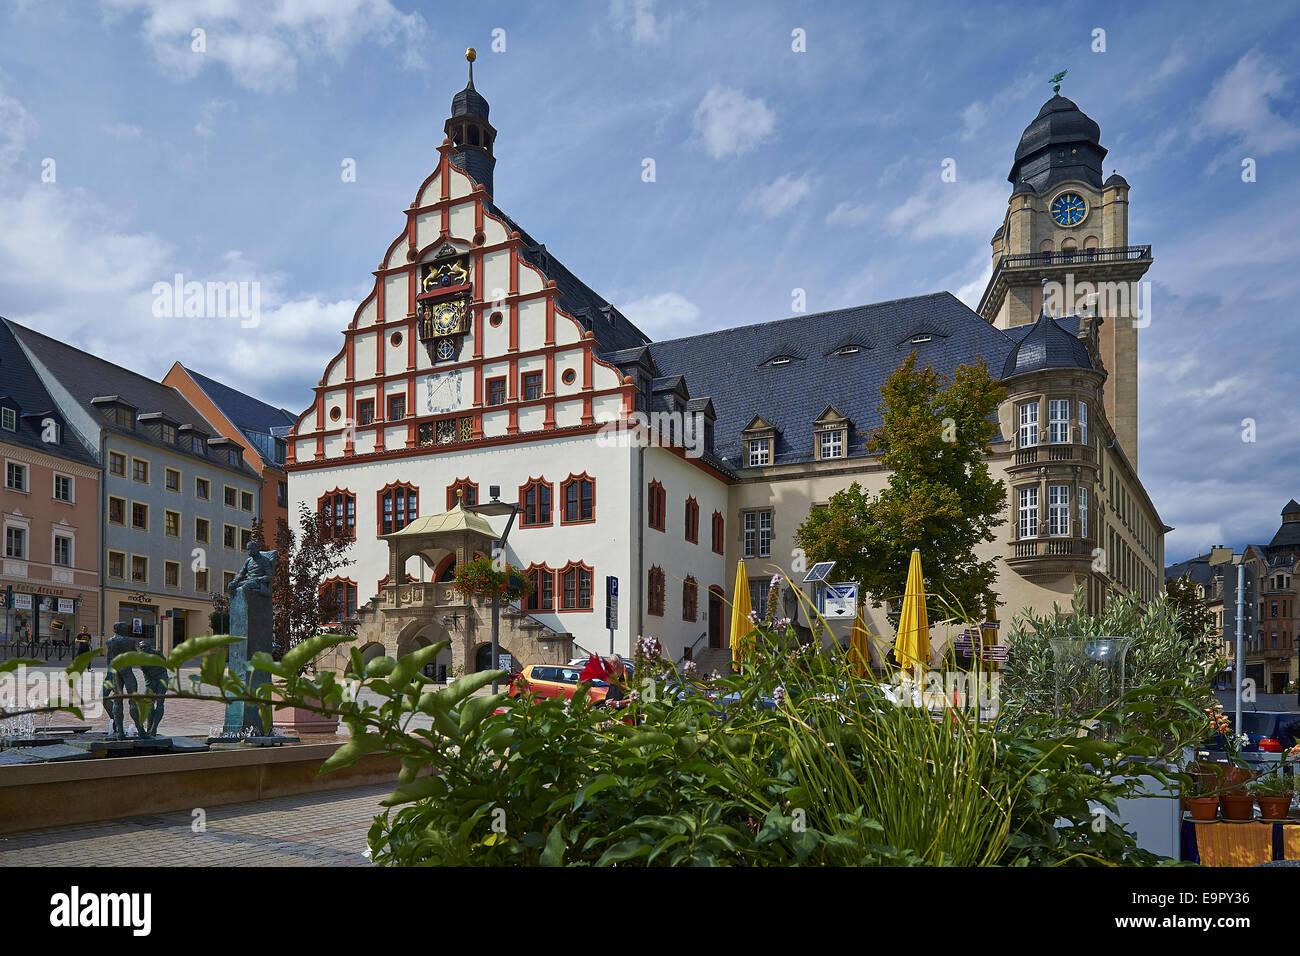 City Hall in Plauen, Germany Stock Photo: 74877578 - Alamy